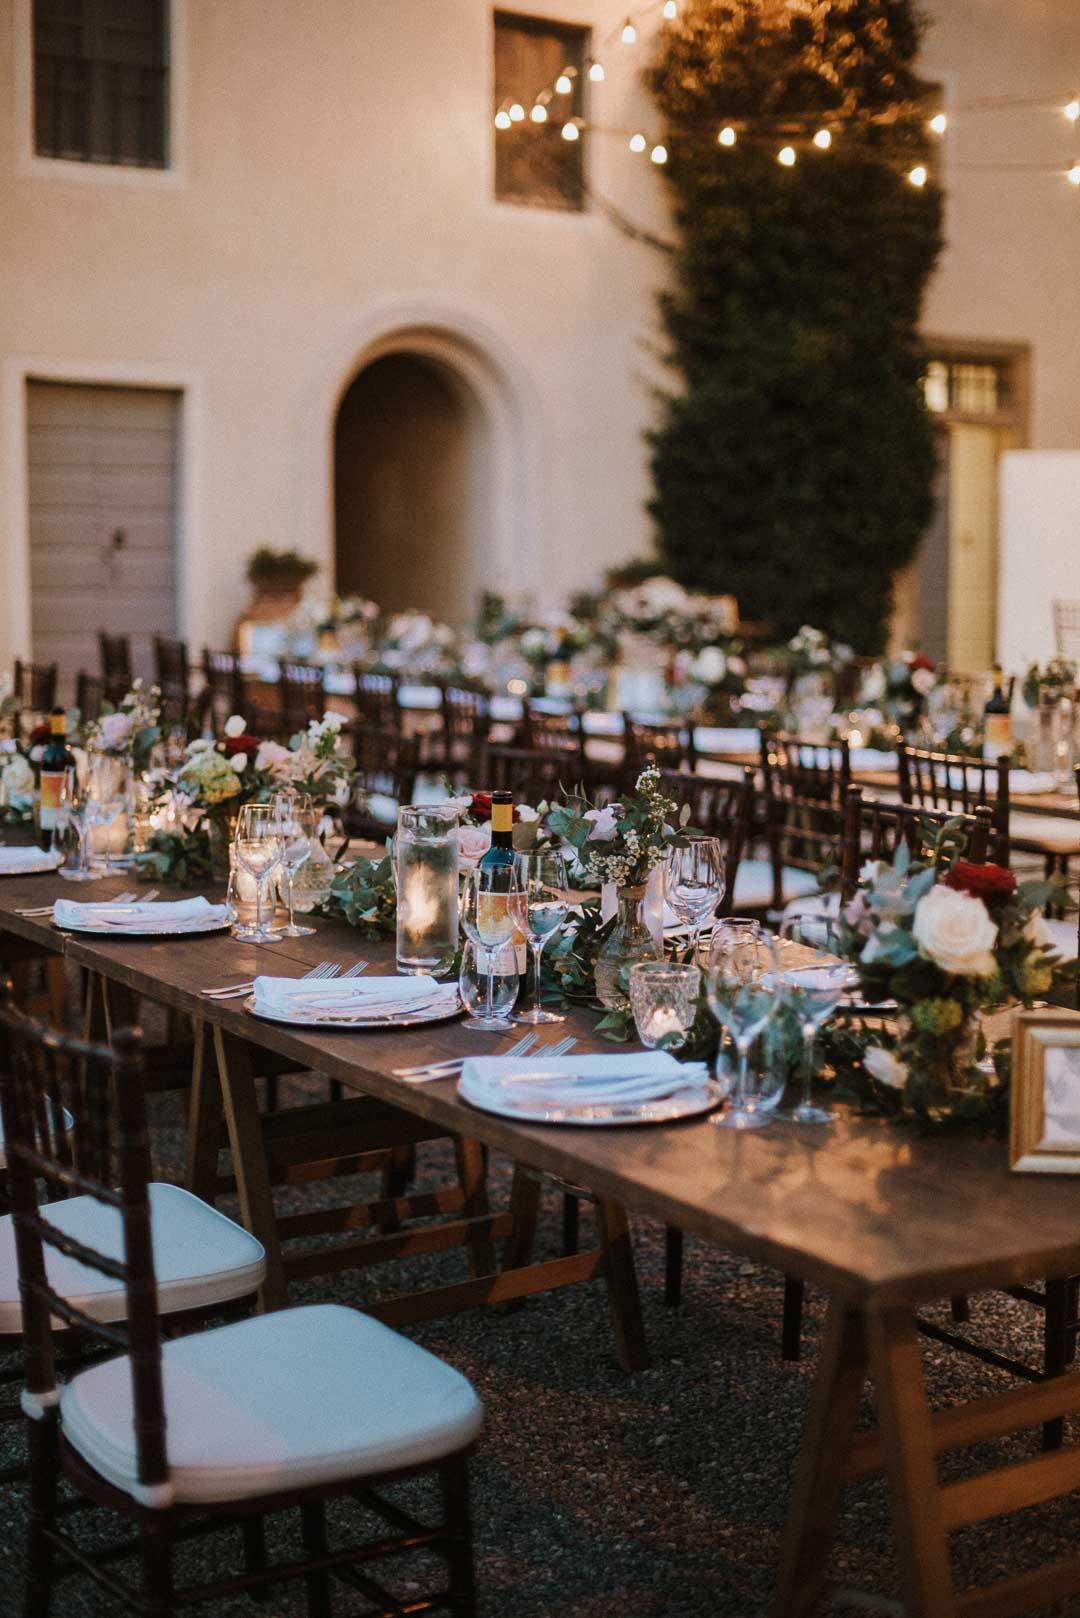 wedding-photographer-destination-fineart-bespoke-reportage-tuscany-villascorzi-vivianeizzo-spazio46-159